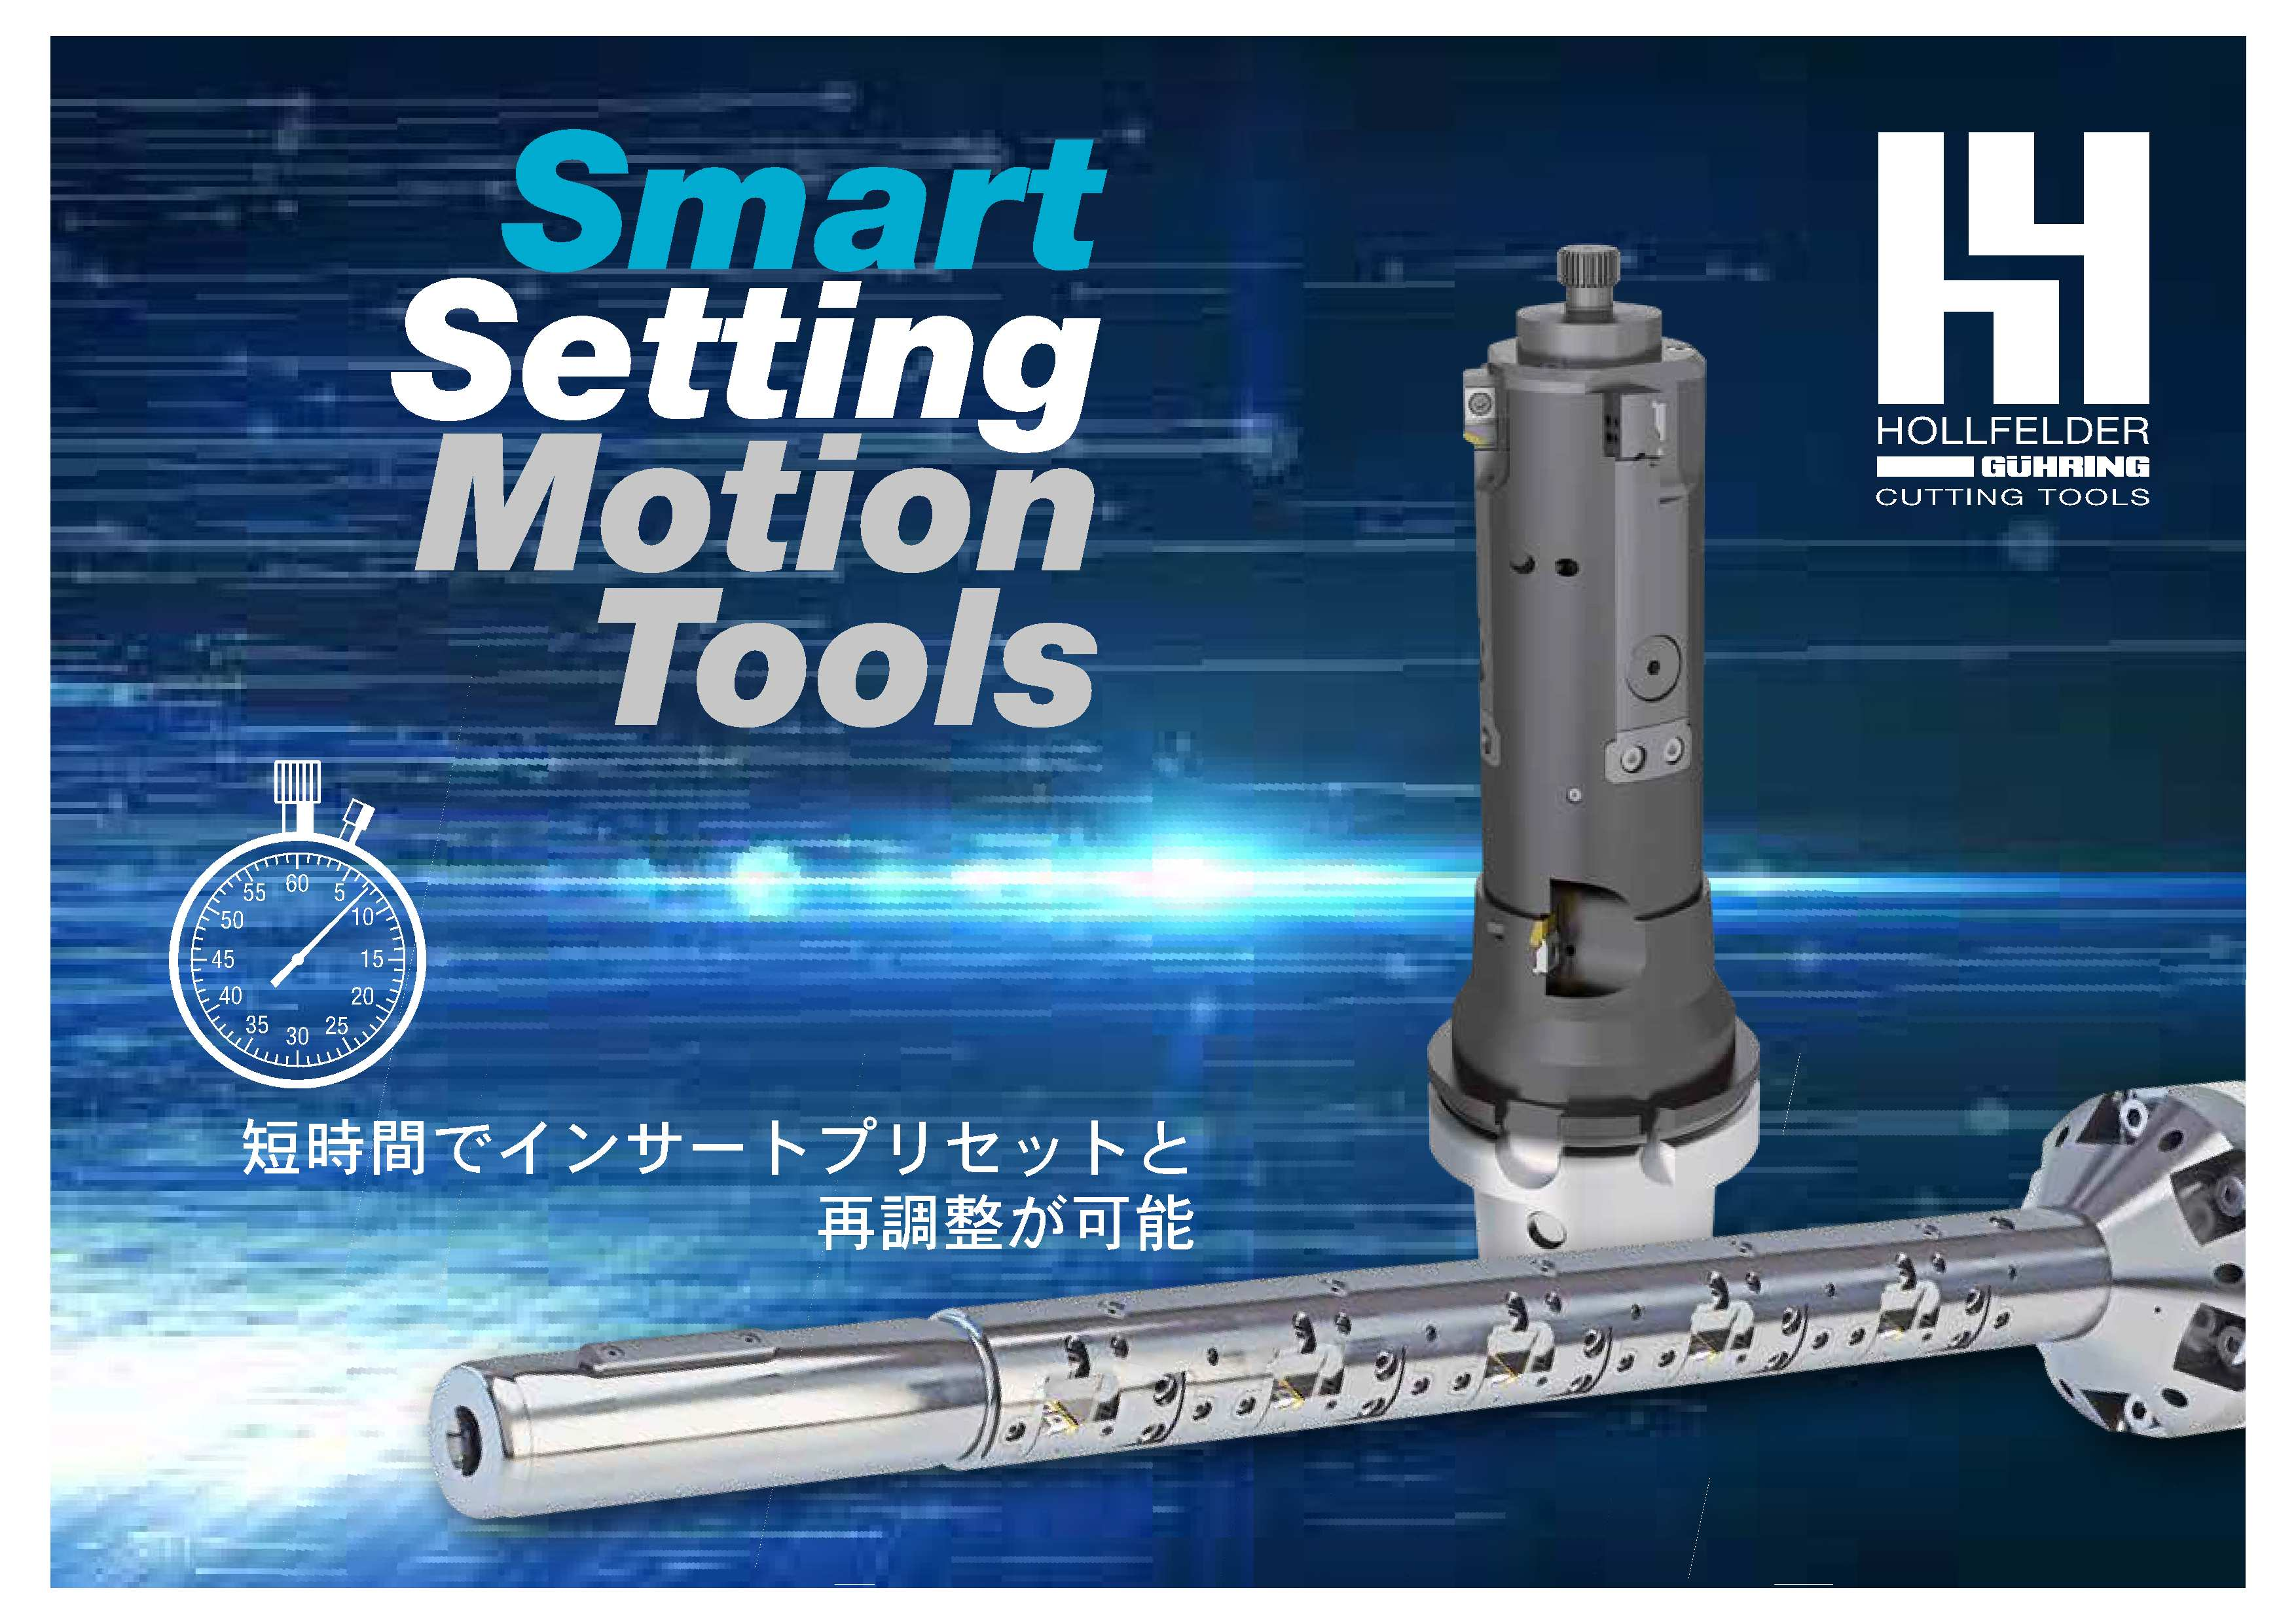 Smart setting motion ツール